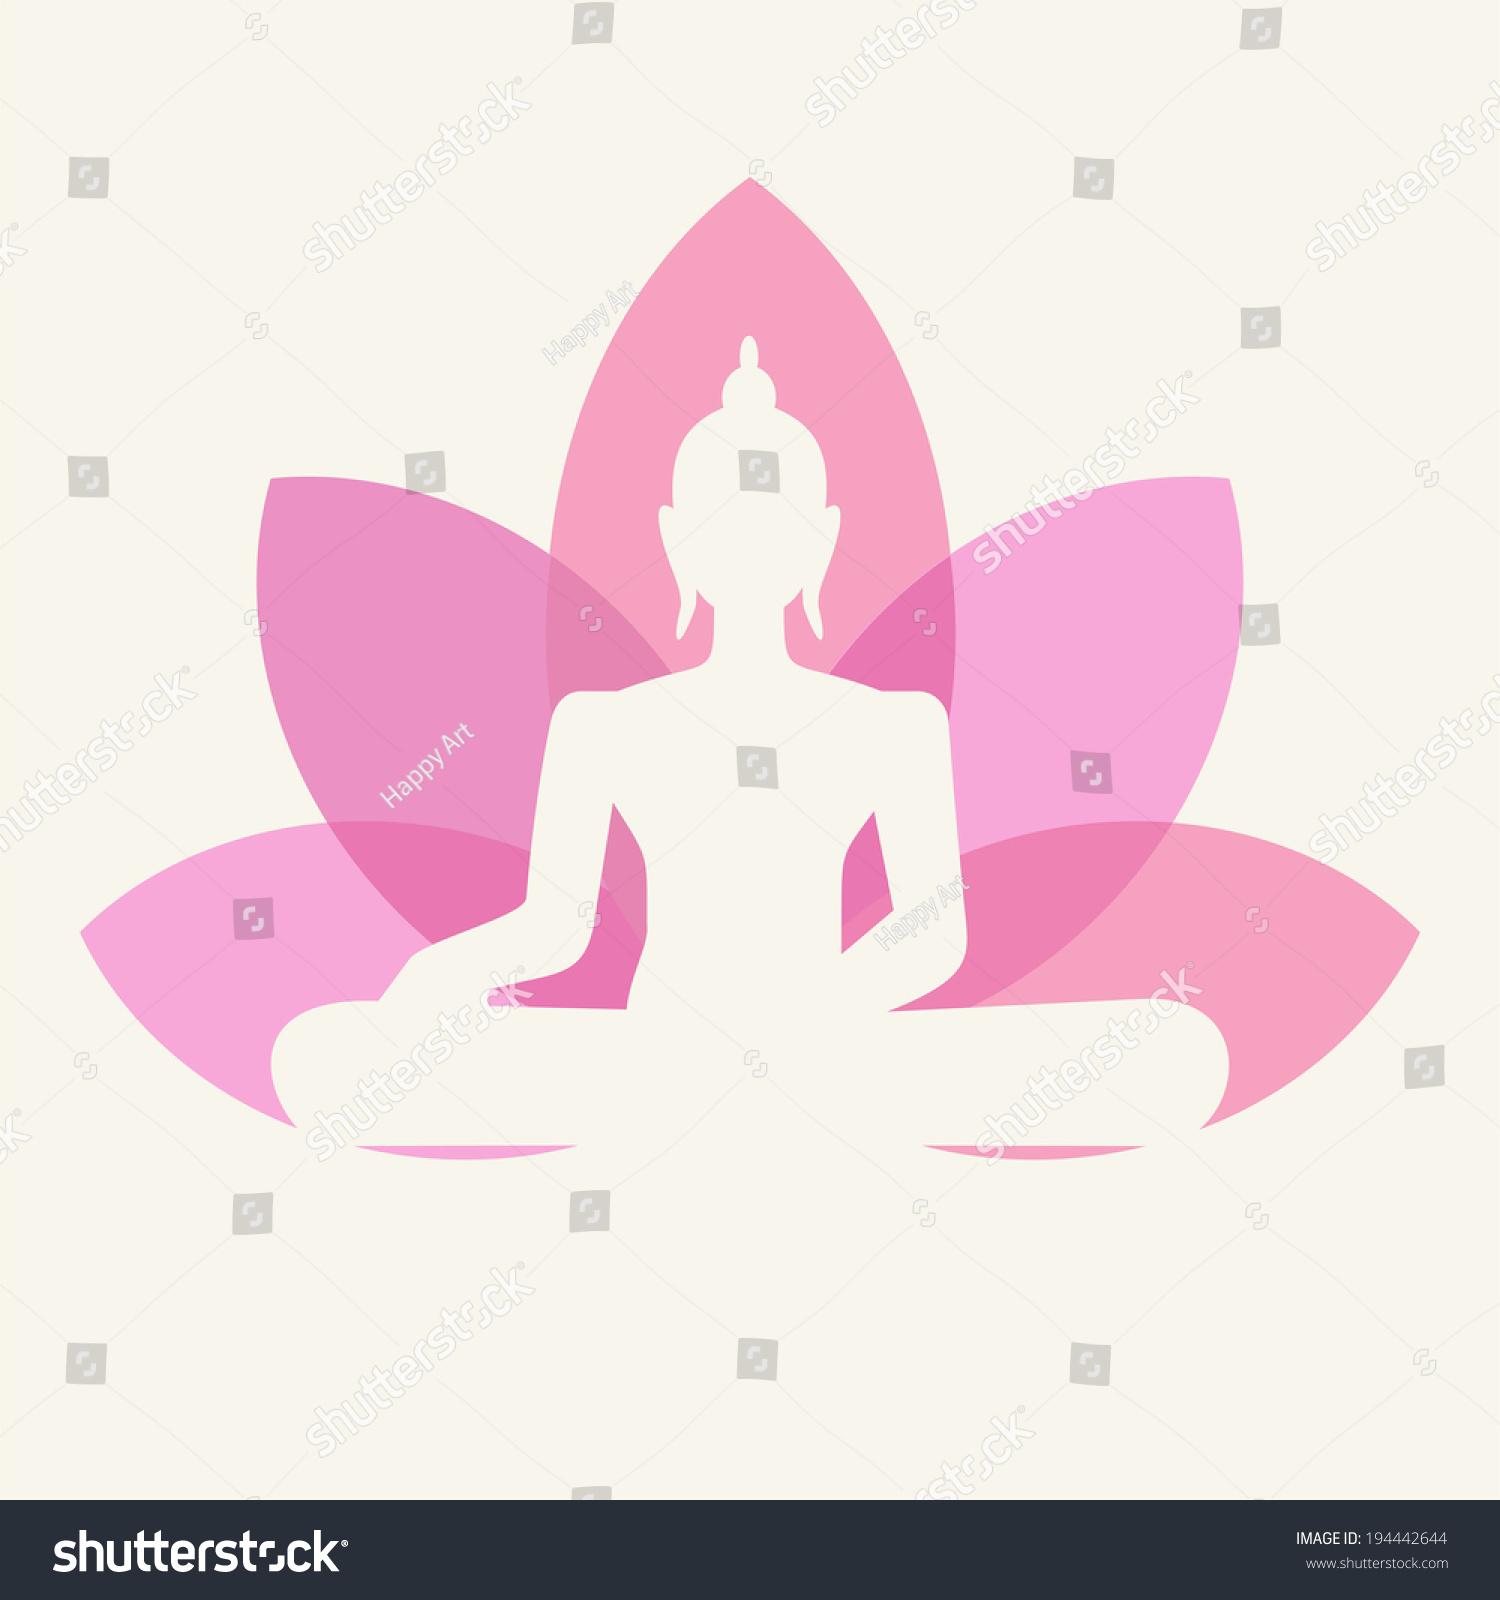 Silhouette of buddha sitting on a lotus flower background ez canvas id 194442644 izmirmasajfo